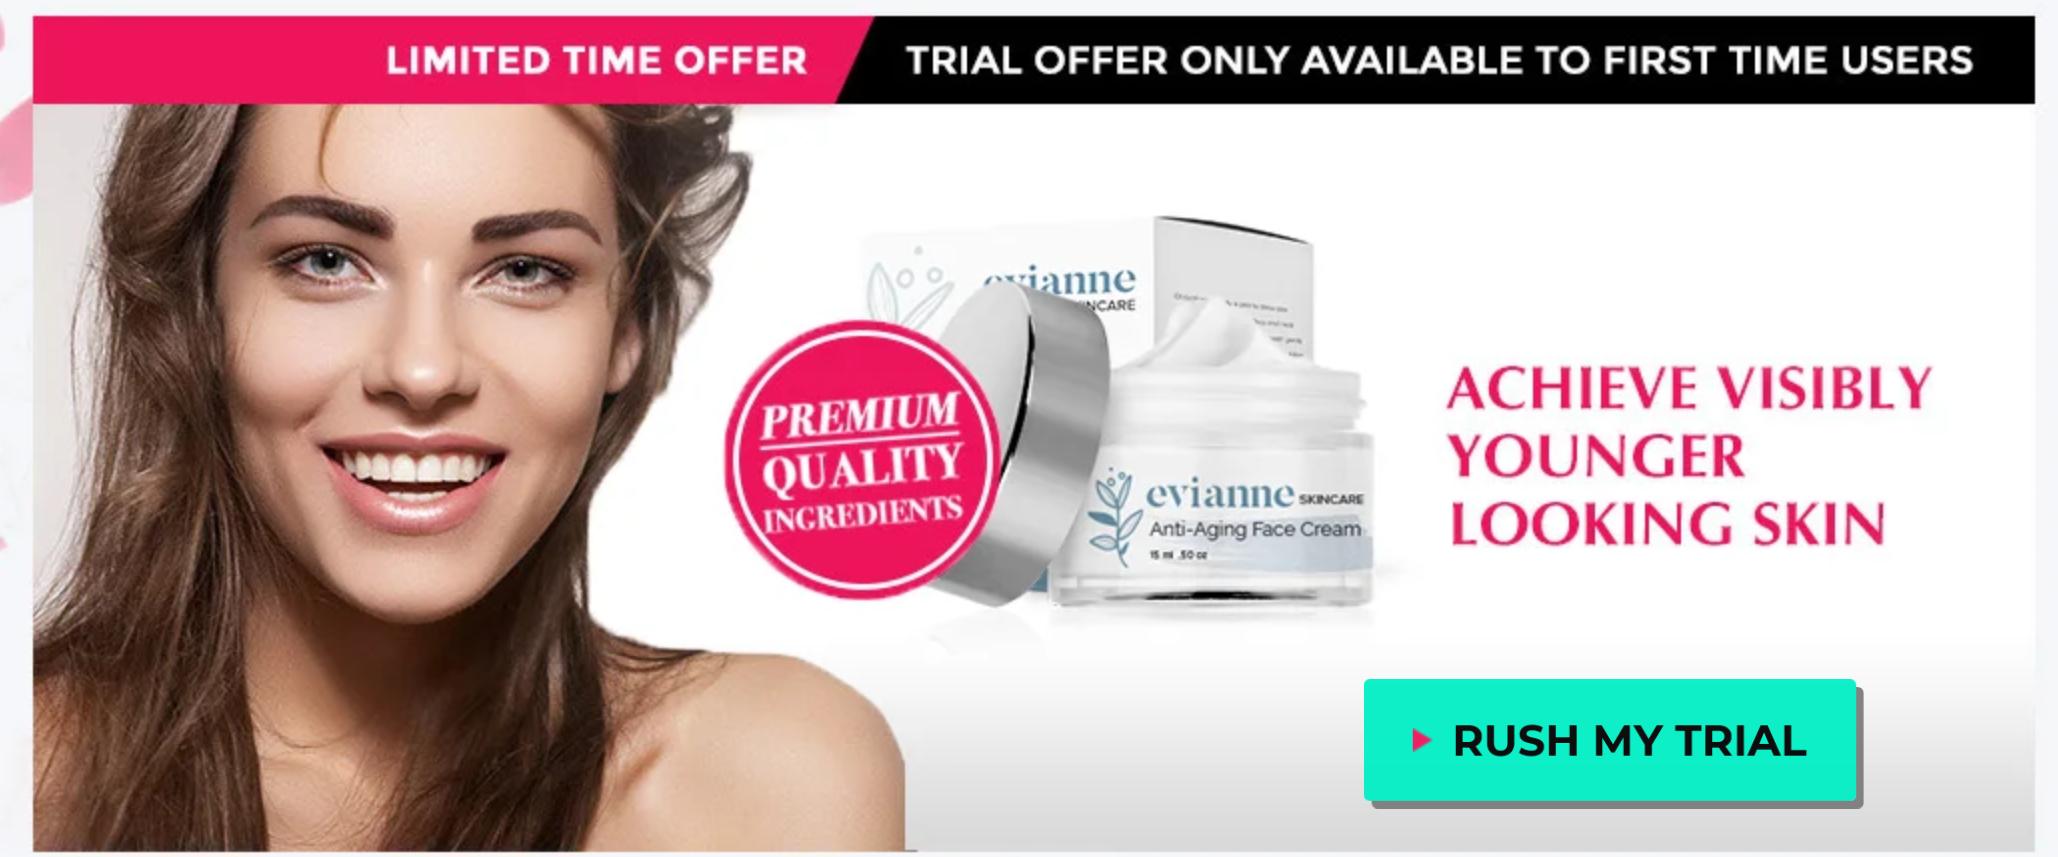 Evianne Skincare